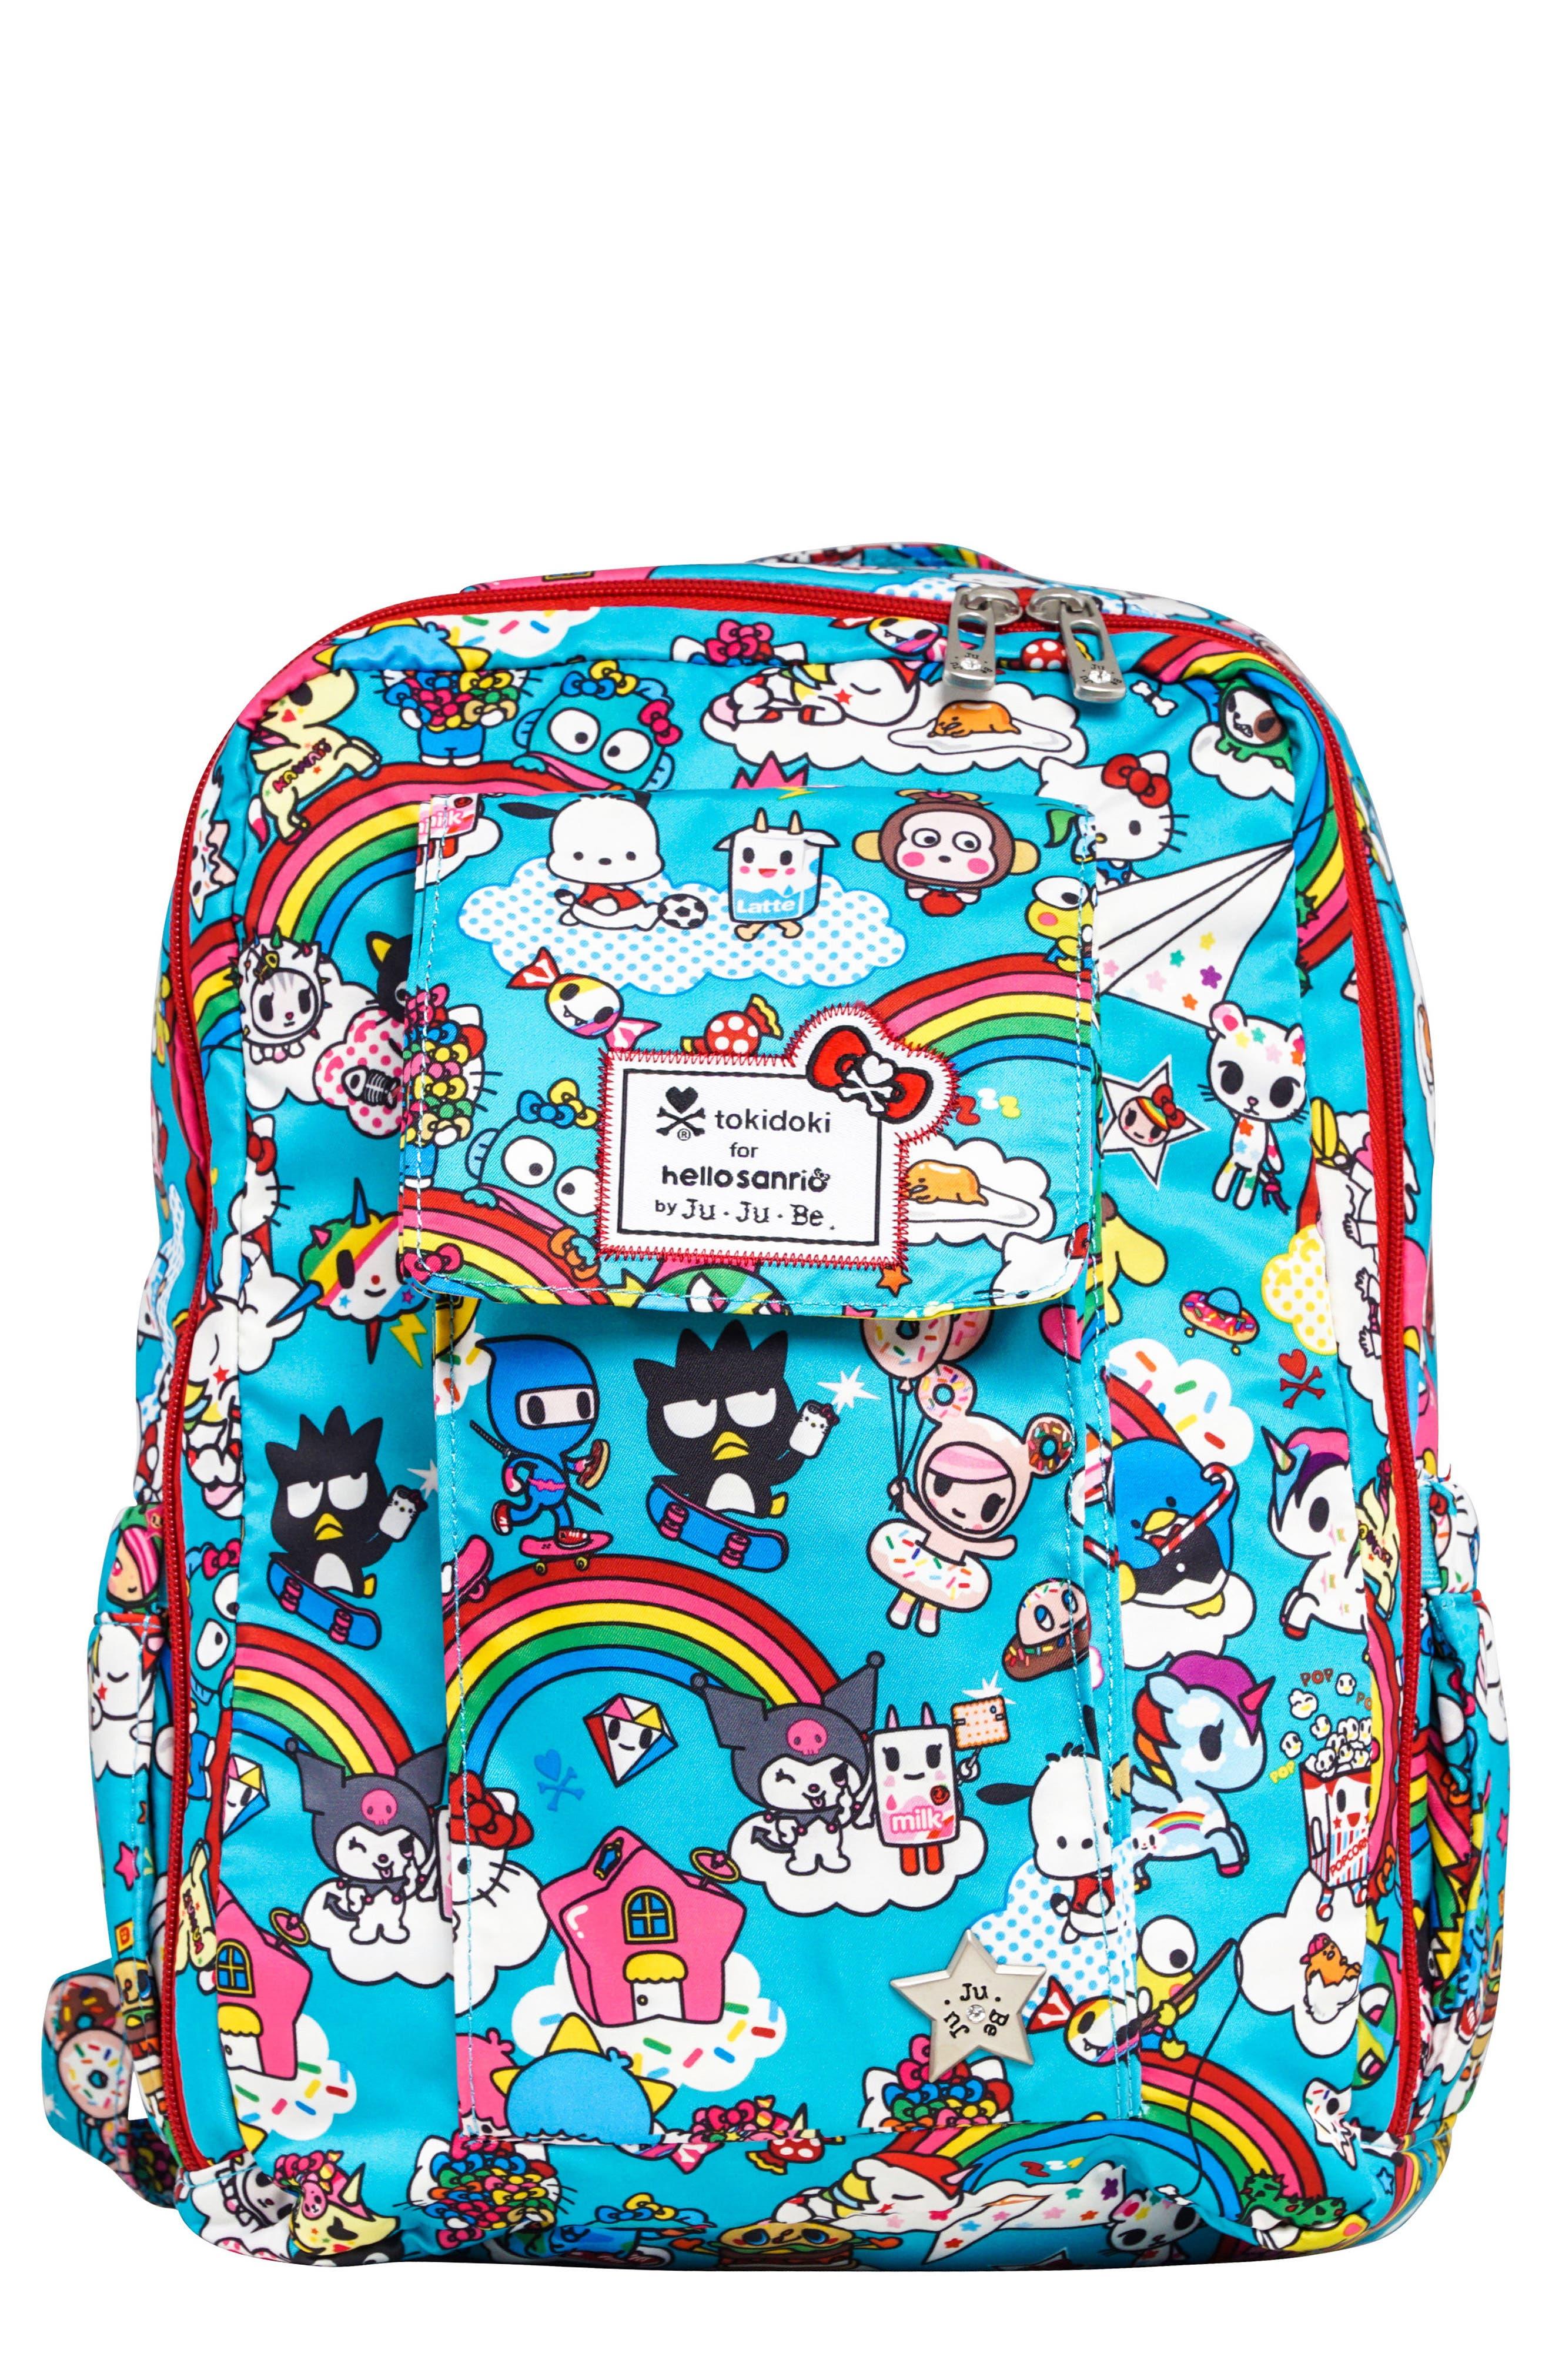 x tokidoki for Hello Sanrio Rainbow Dreams Be Mini Backpack,                             Main thumbnail 1, color,                             433